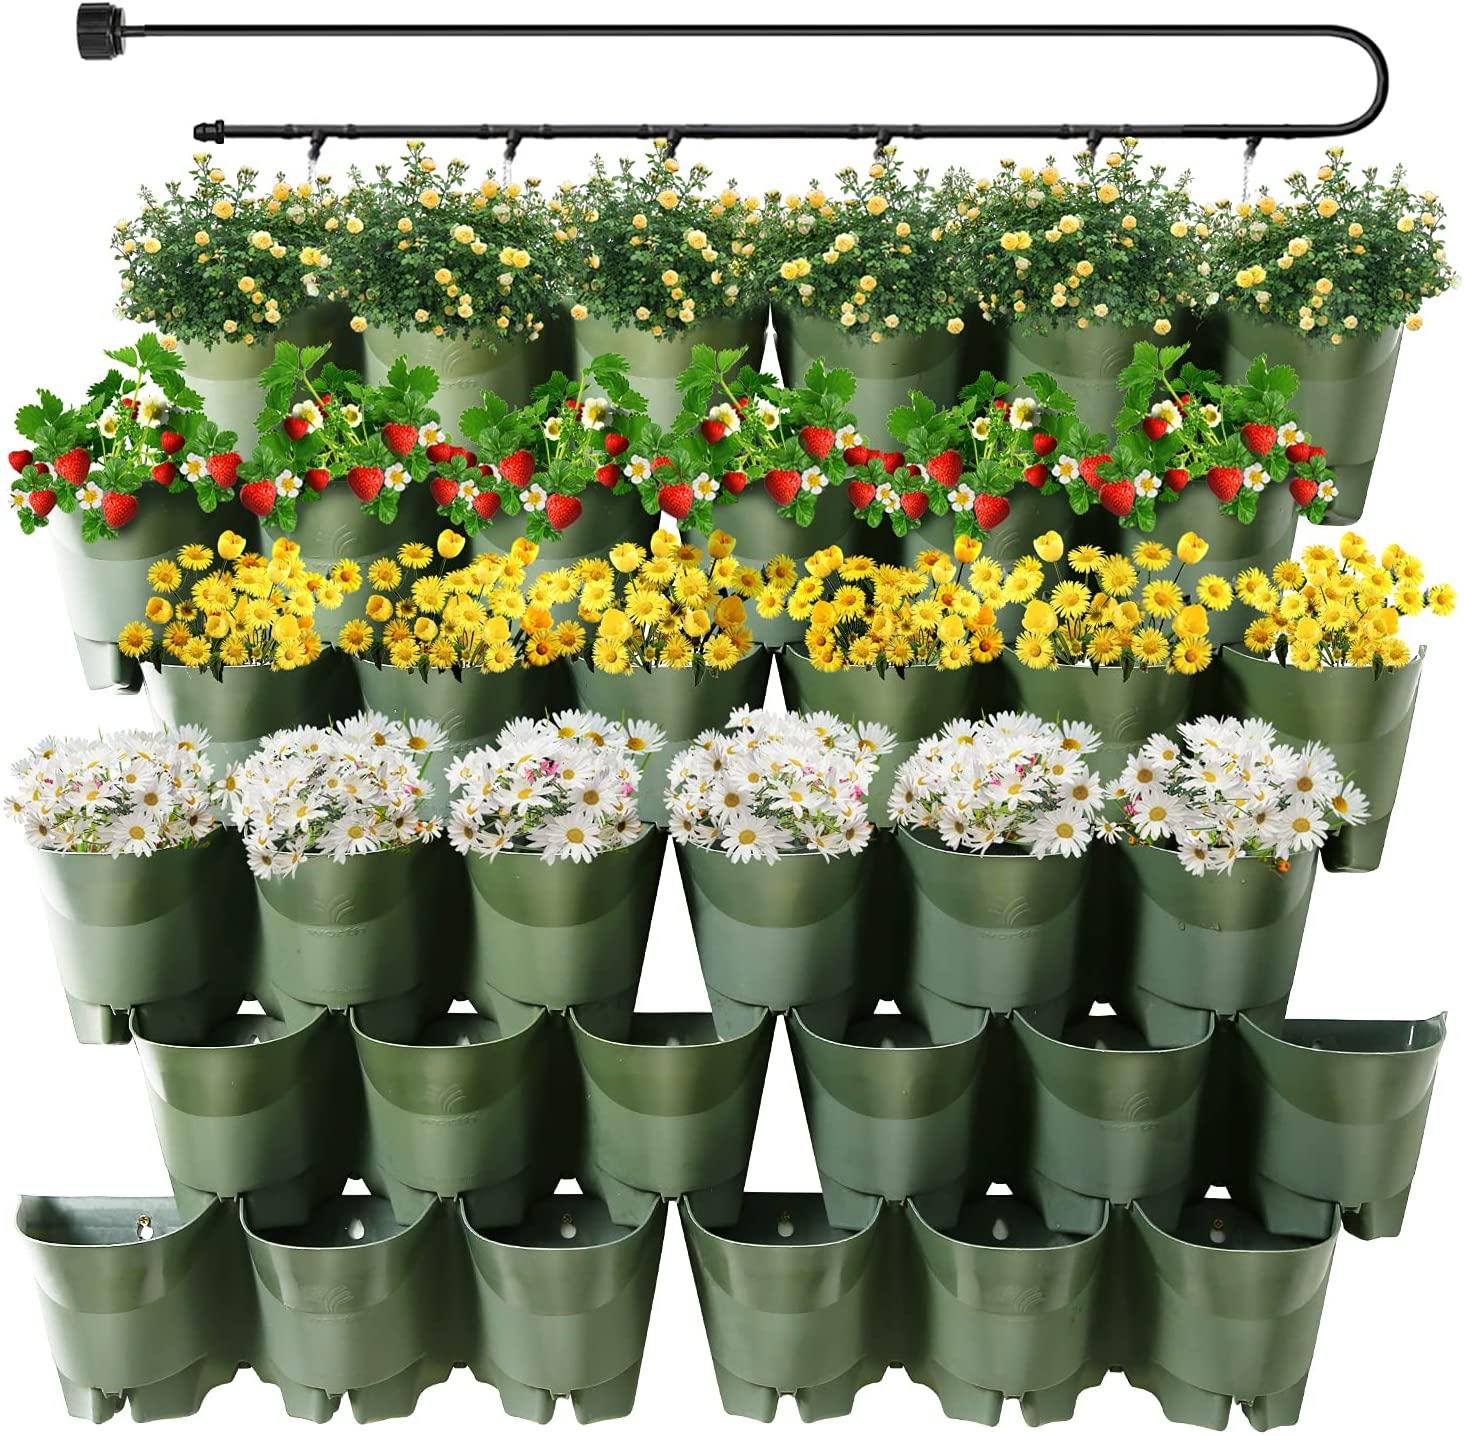 Worth Garden Self Watering Vertical Planter